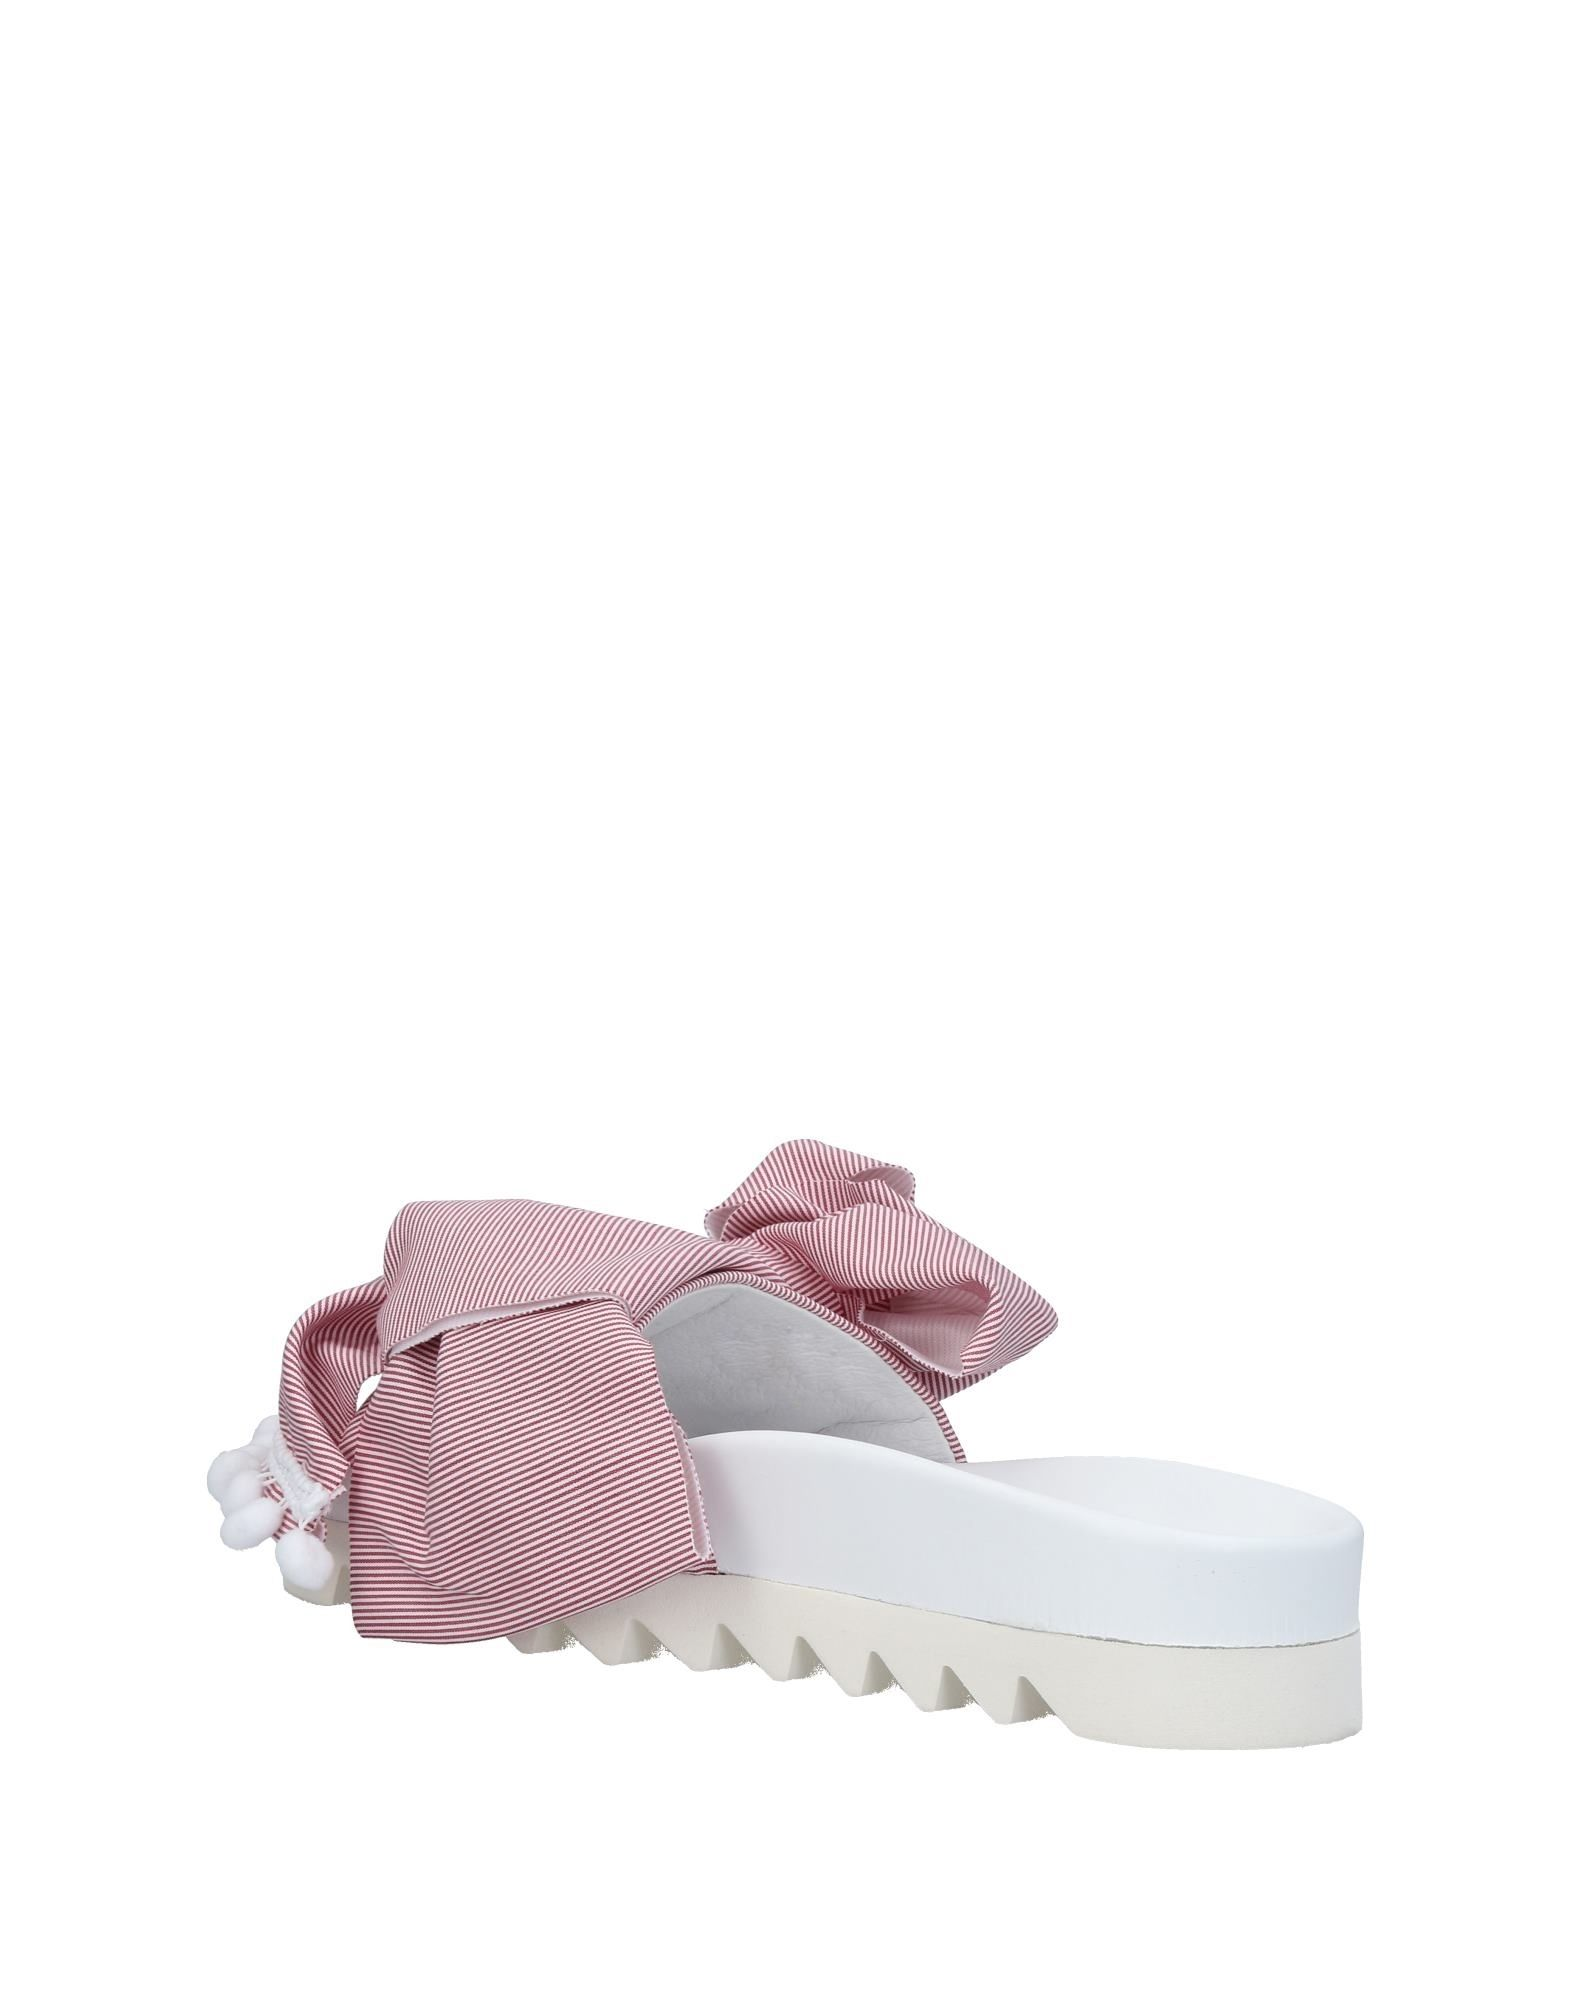 Gut tragenJoshua*S um billige Schuhe zu tragenJoshua*S Gut Sandalen Damen  11439997HS 9e1c87